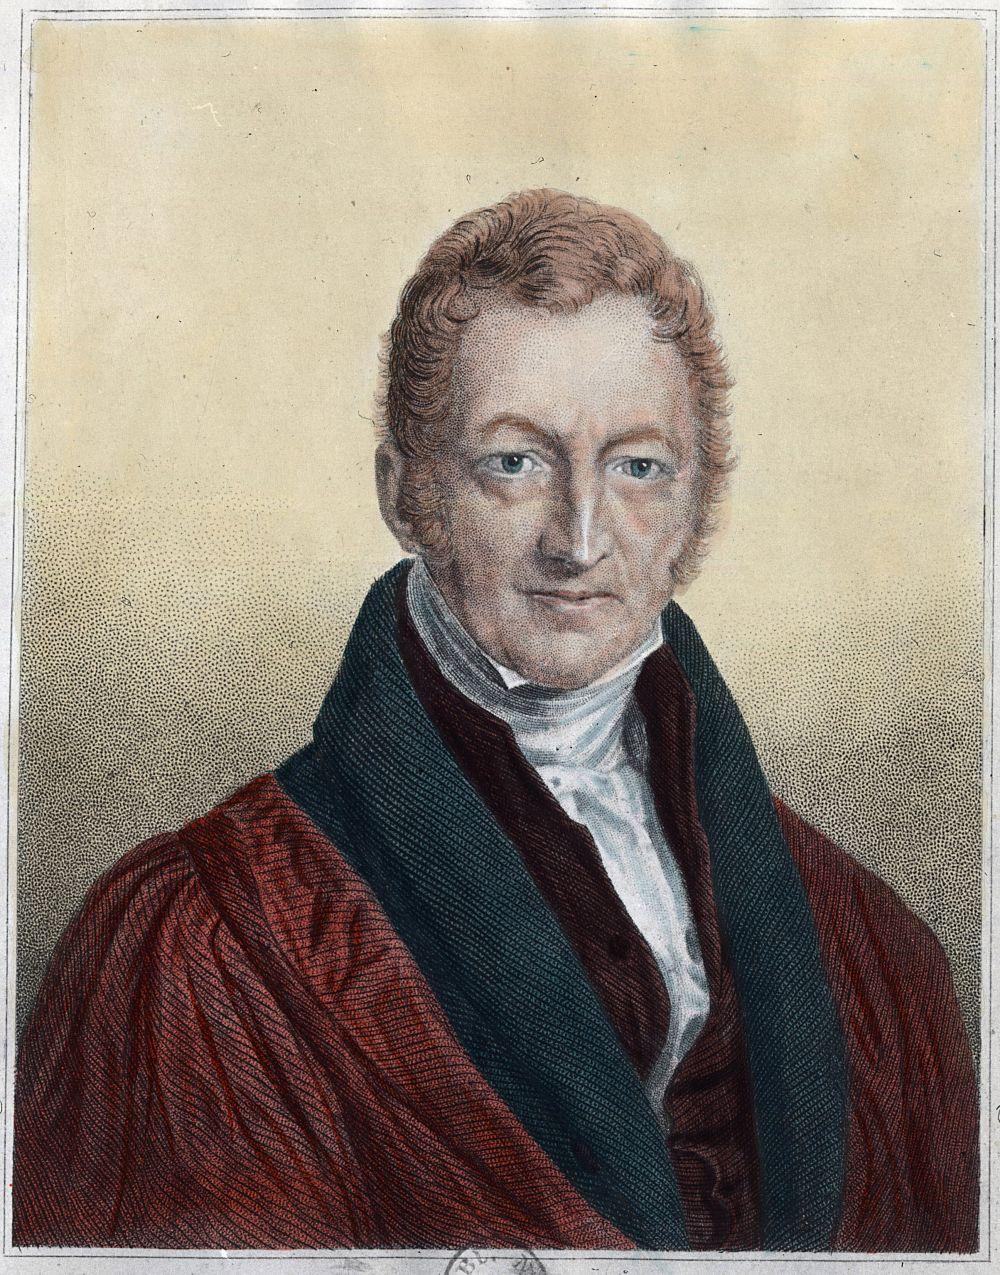 023 Thomas Malthus Essay On The Principle Of Population Example W1000 1798 1 Principe Stupendous After Reading Malthus's Principles Darwin Got Idea That Ap Euro Full